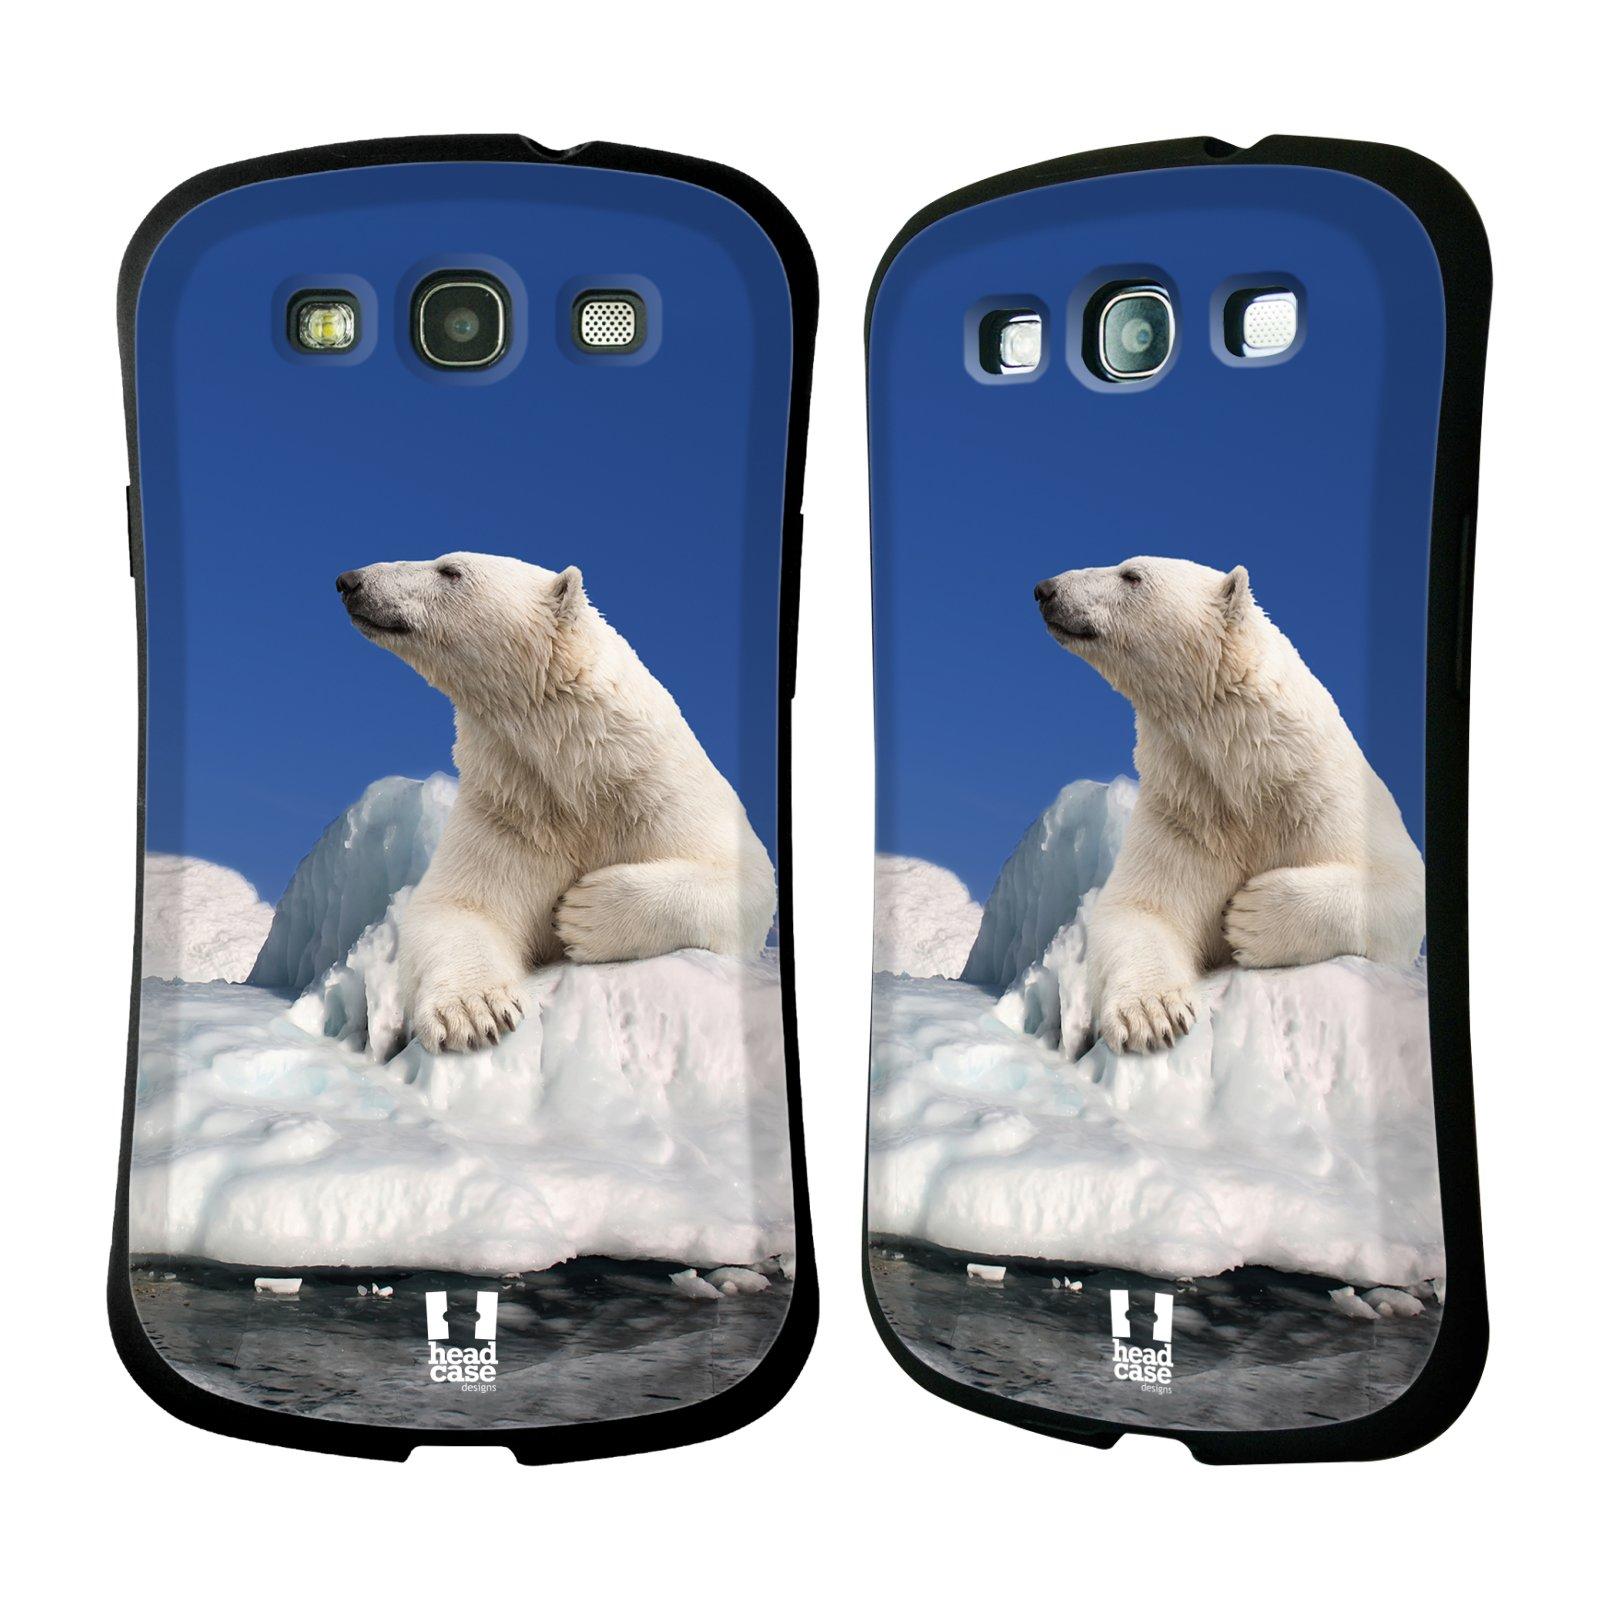 HEAD CASE silikon/plast odolný obal na mobil Samsung Galaxy S3 vzor Divočina, Divoký život a zvířata foto LEDNÍ MEDVĚD NA LEDOVCI A NEBE MODRÁ